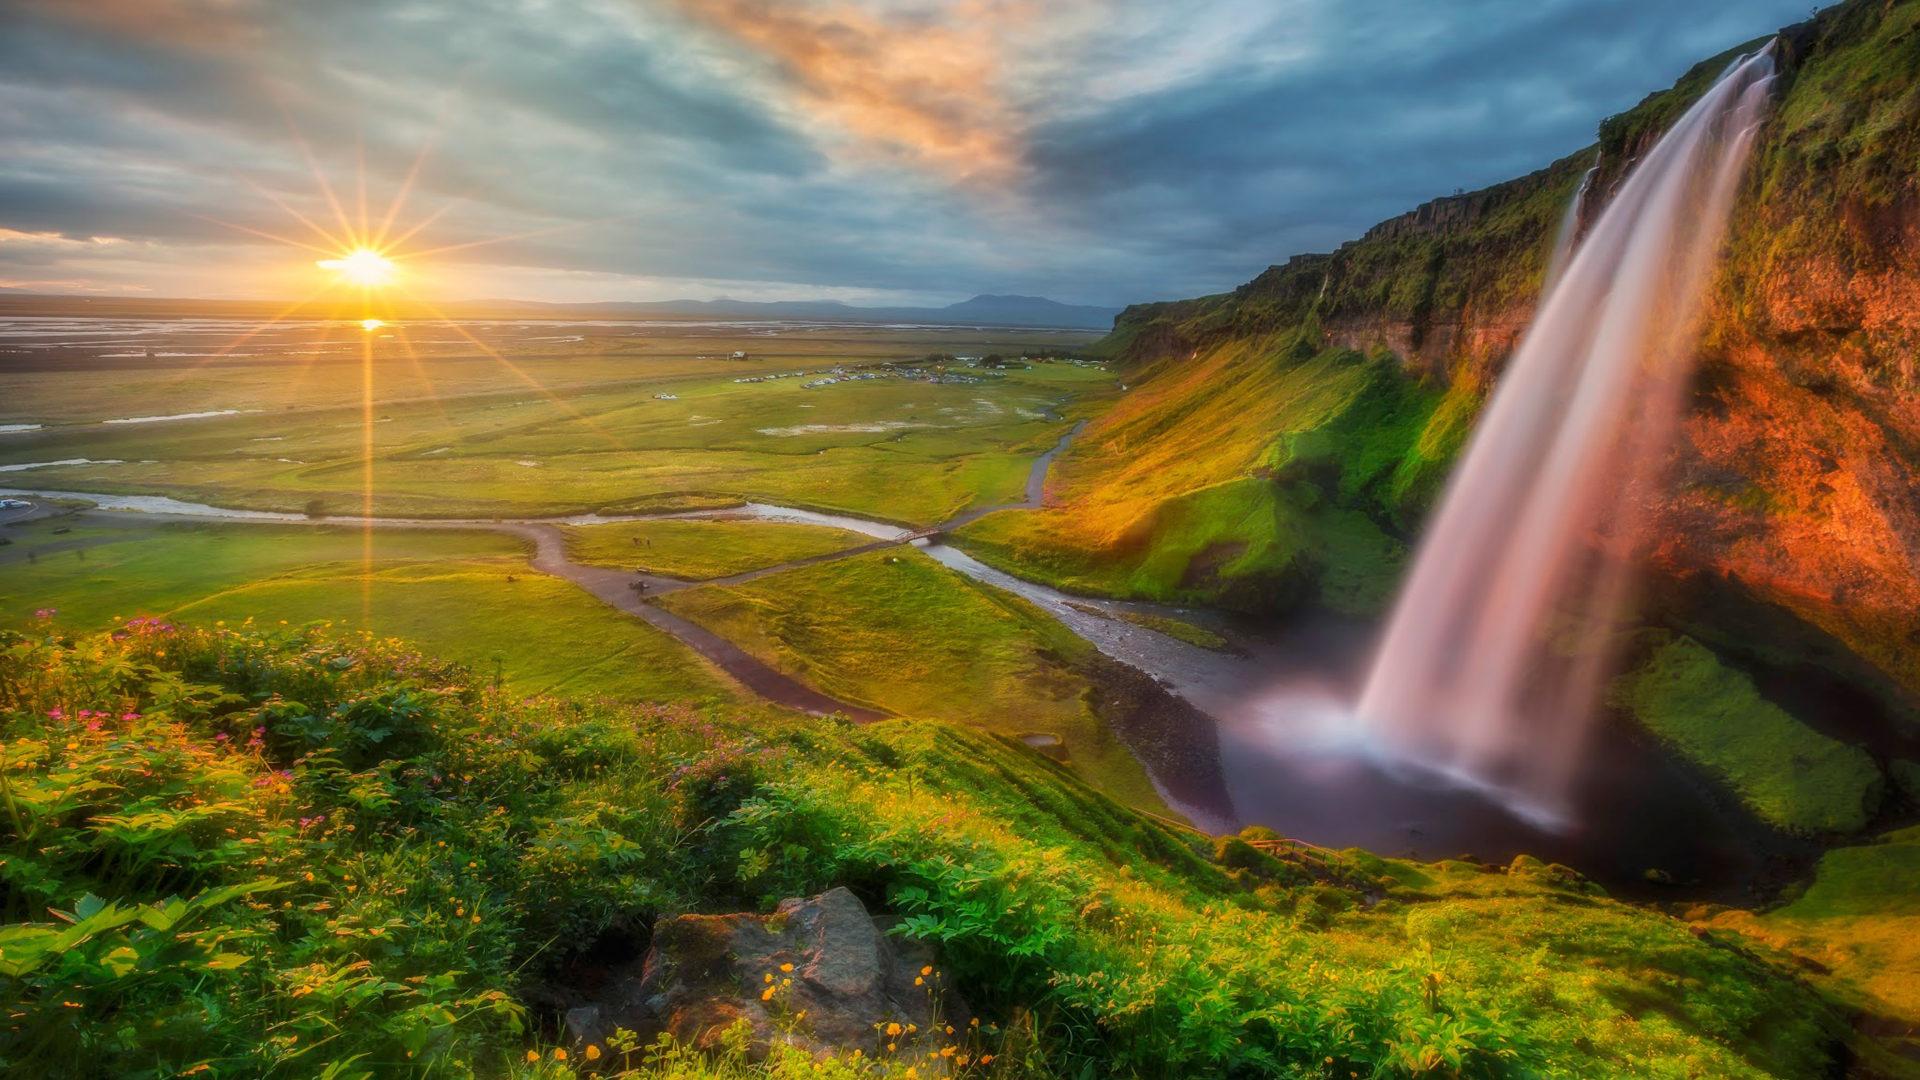 Desktop Wallpaper Images High Resolution Fall Photo Wallpaper Hd Waterfall River Valley Sunset